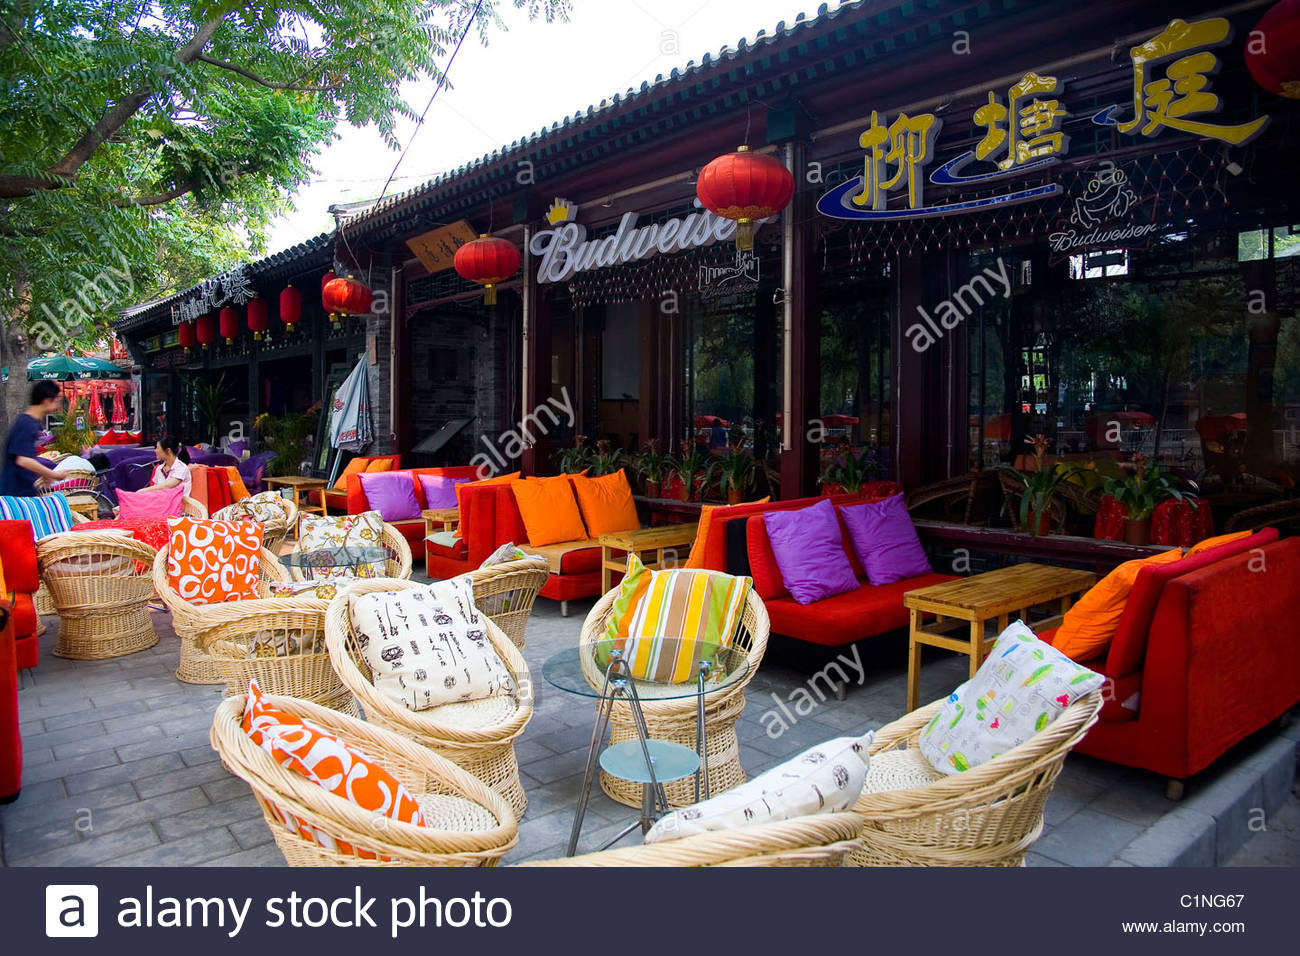 Beijing City, hutong café and bar, Shichahai, Houhai District, China - Stock Image